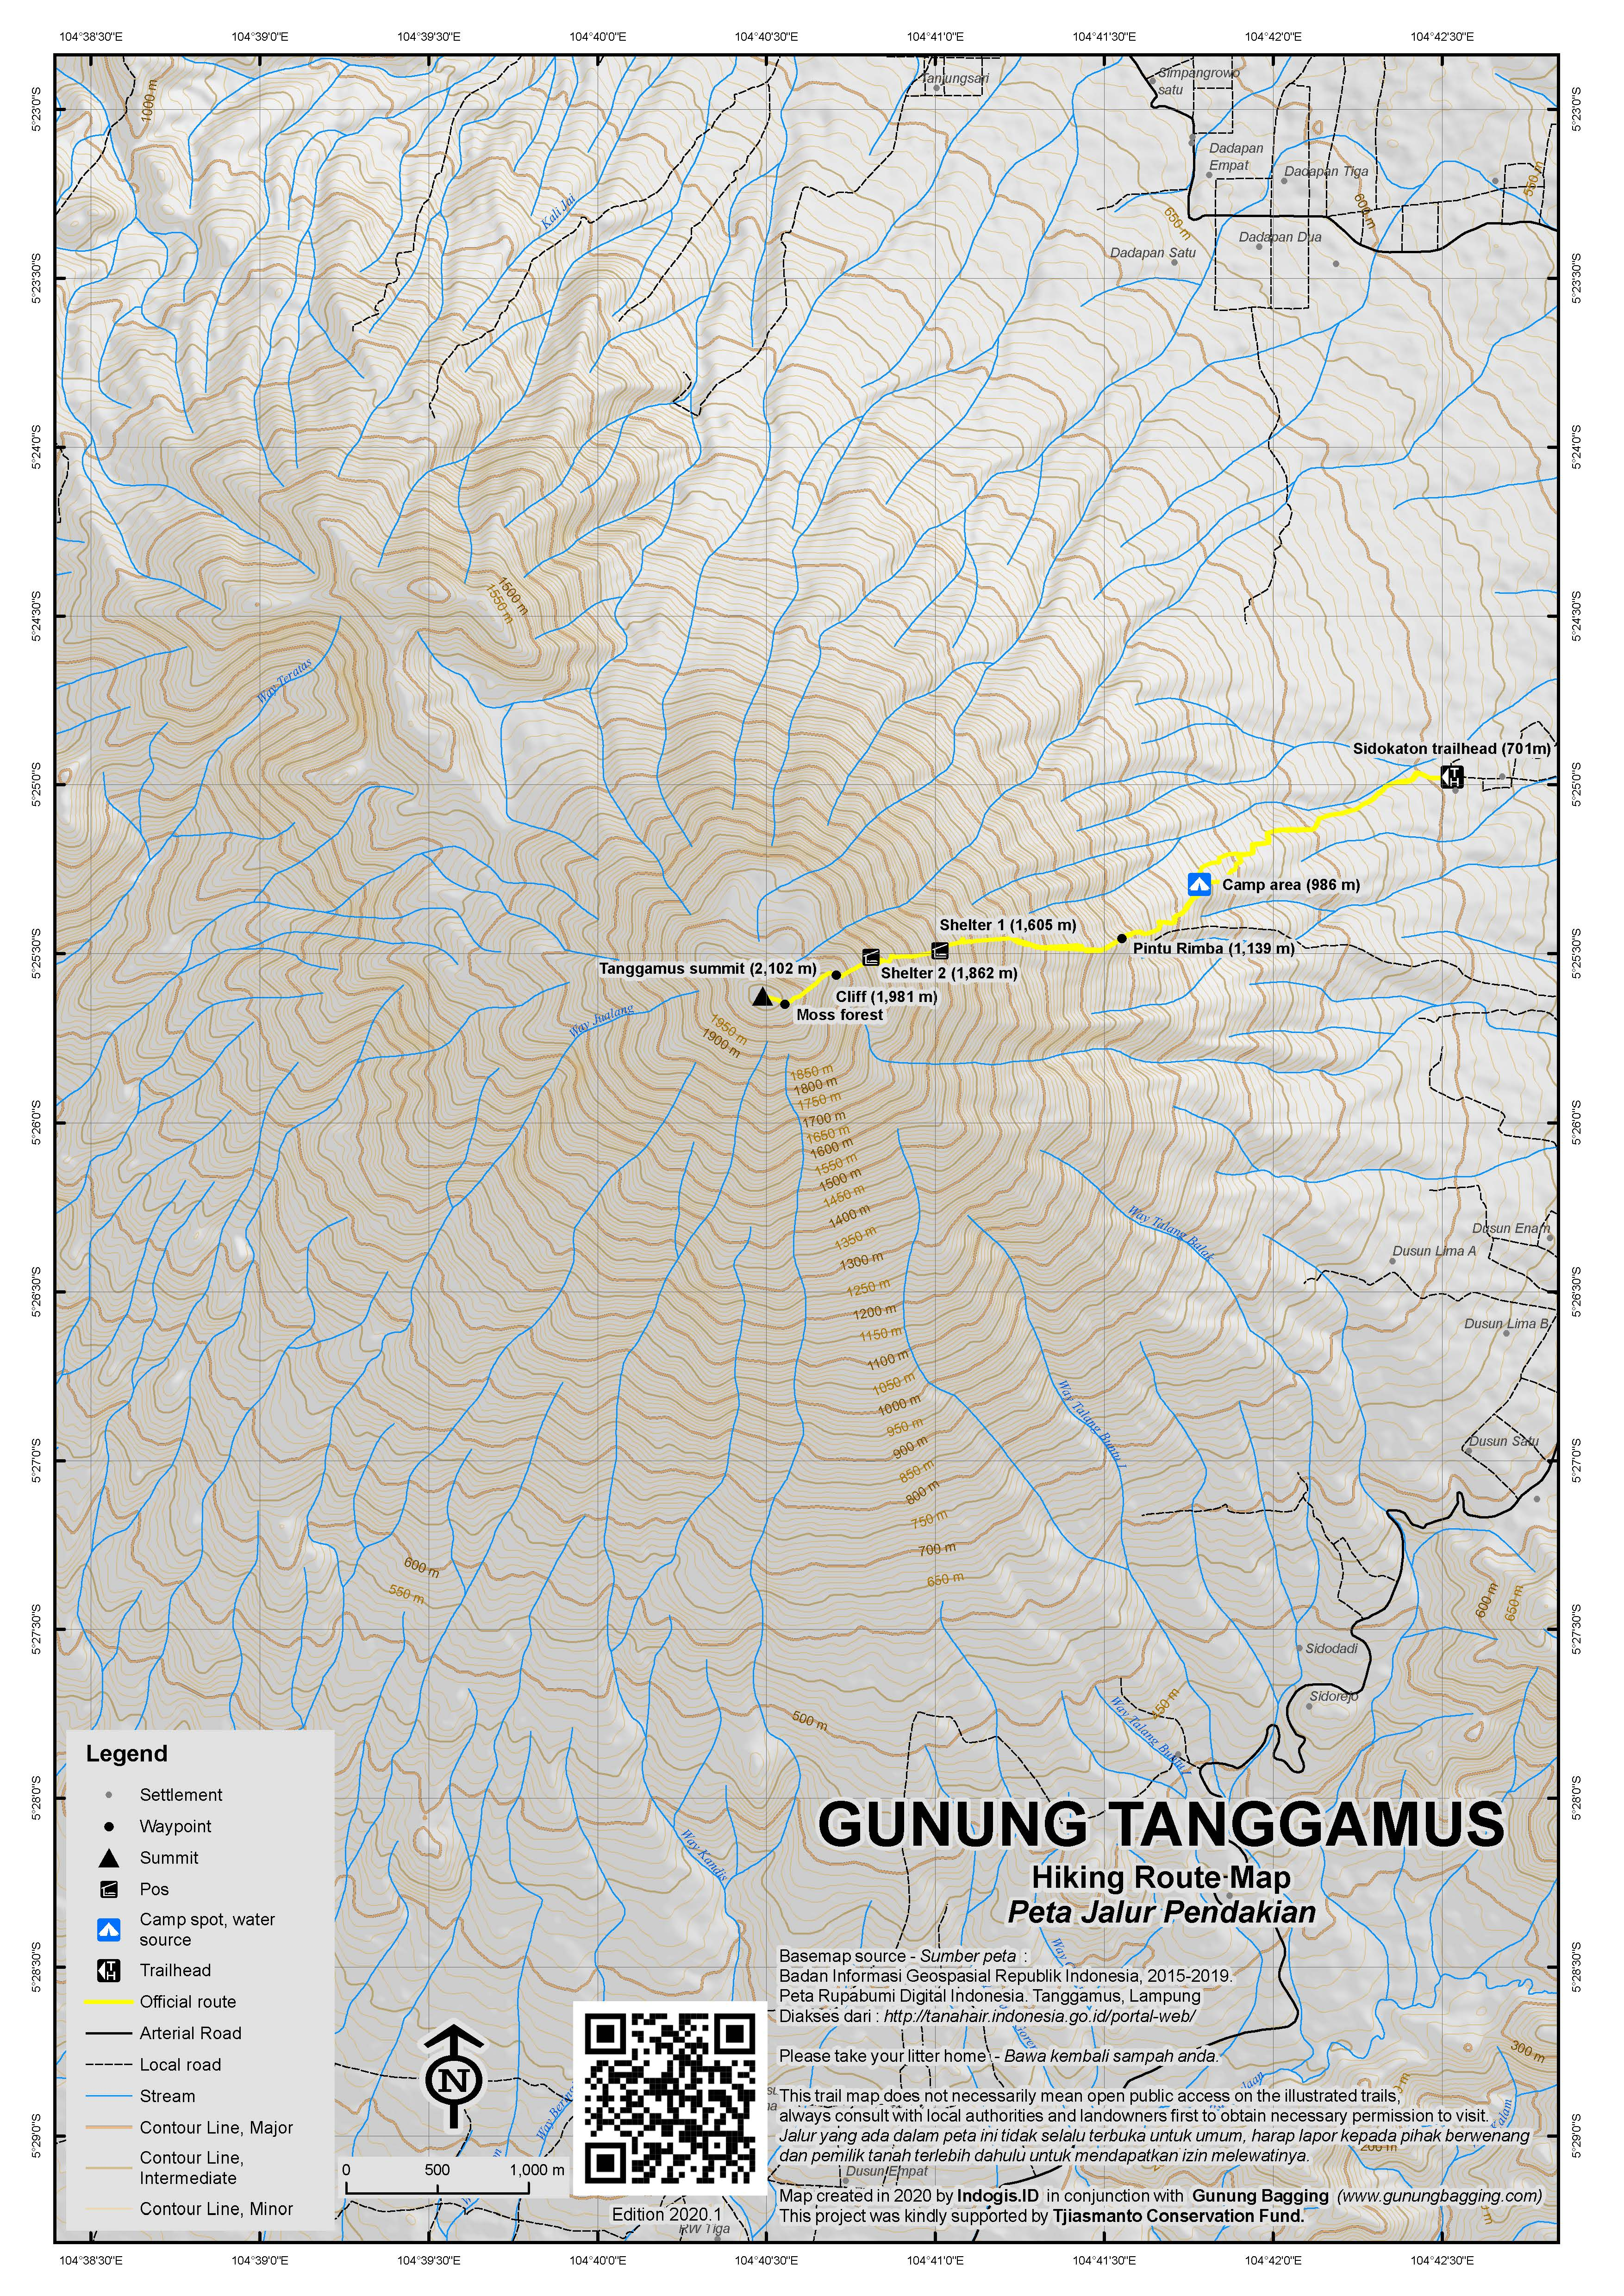 Peta Jalur Pendakian Gunung Tanggamus